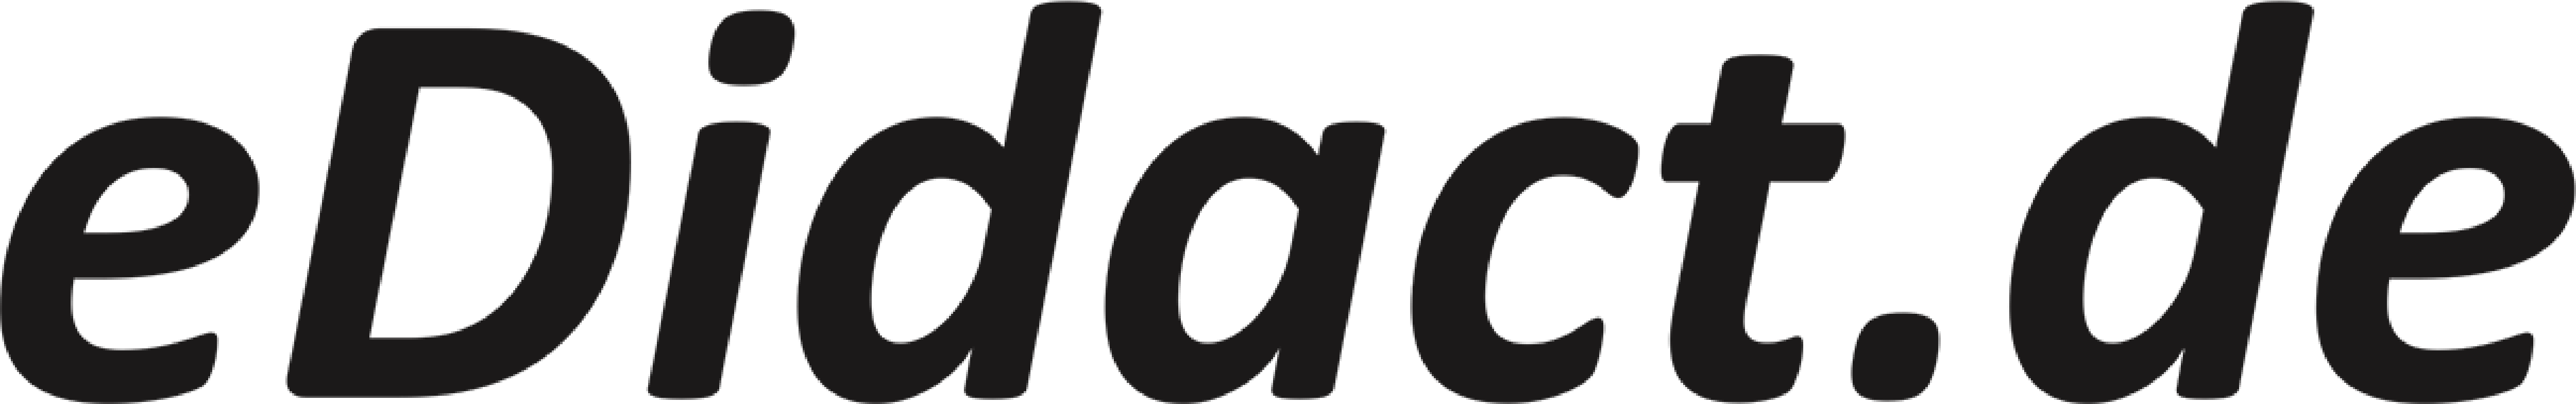 Mediengruppe Oberfranken – Fachverlage (eDidact)